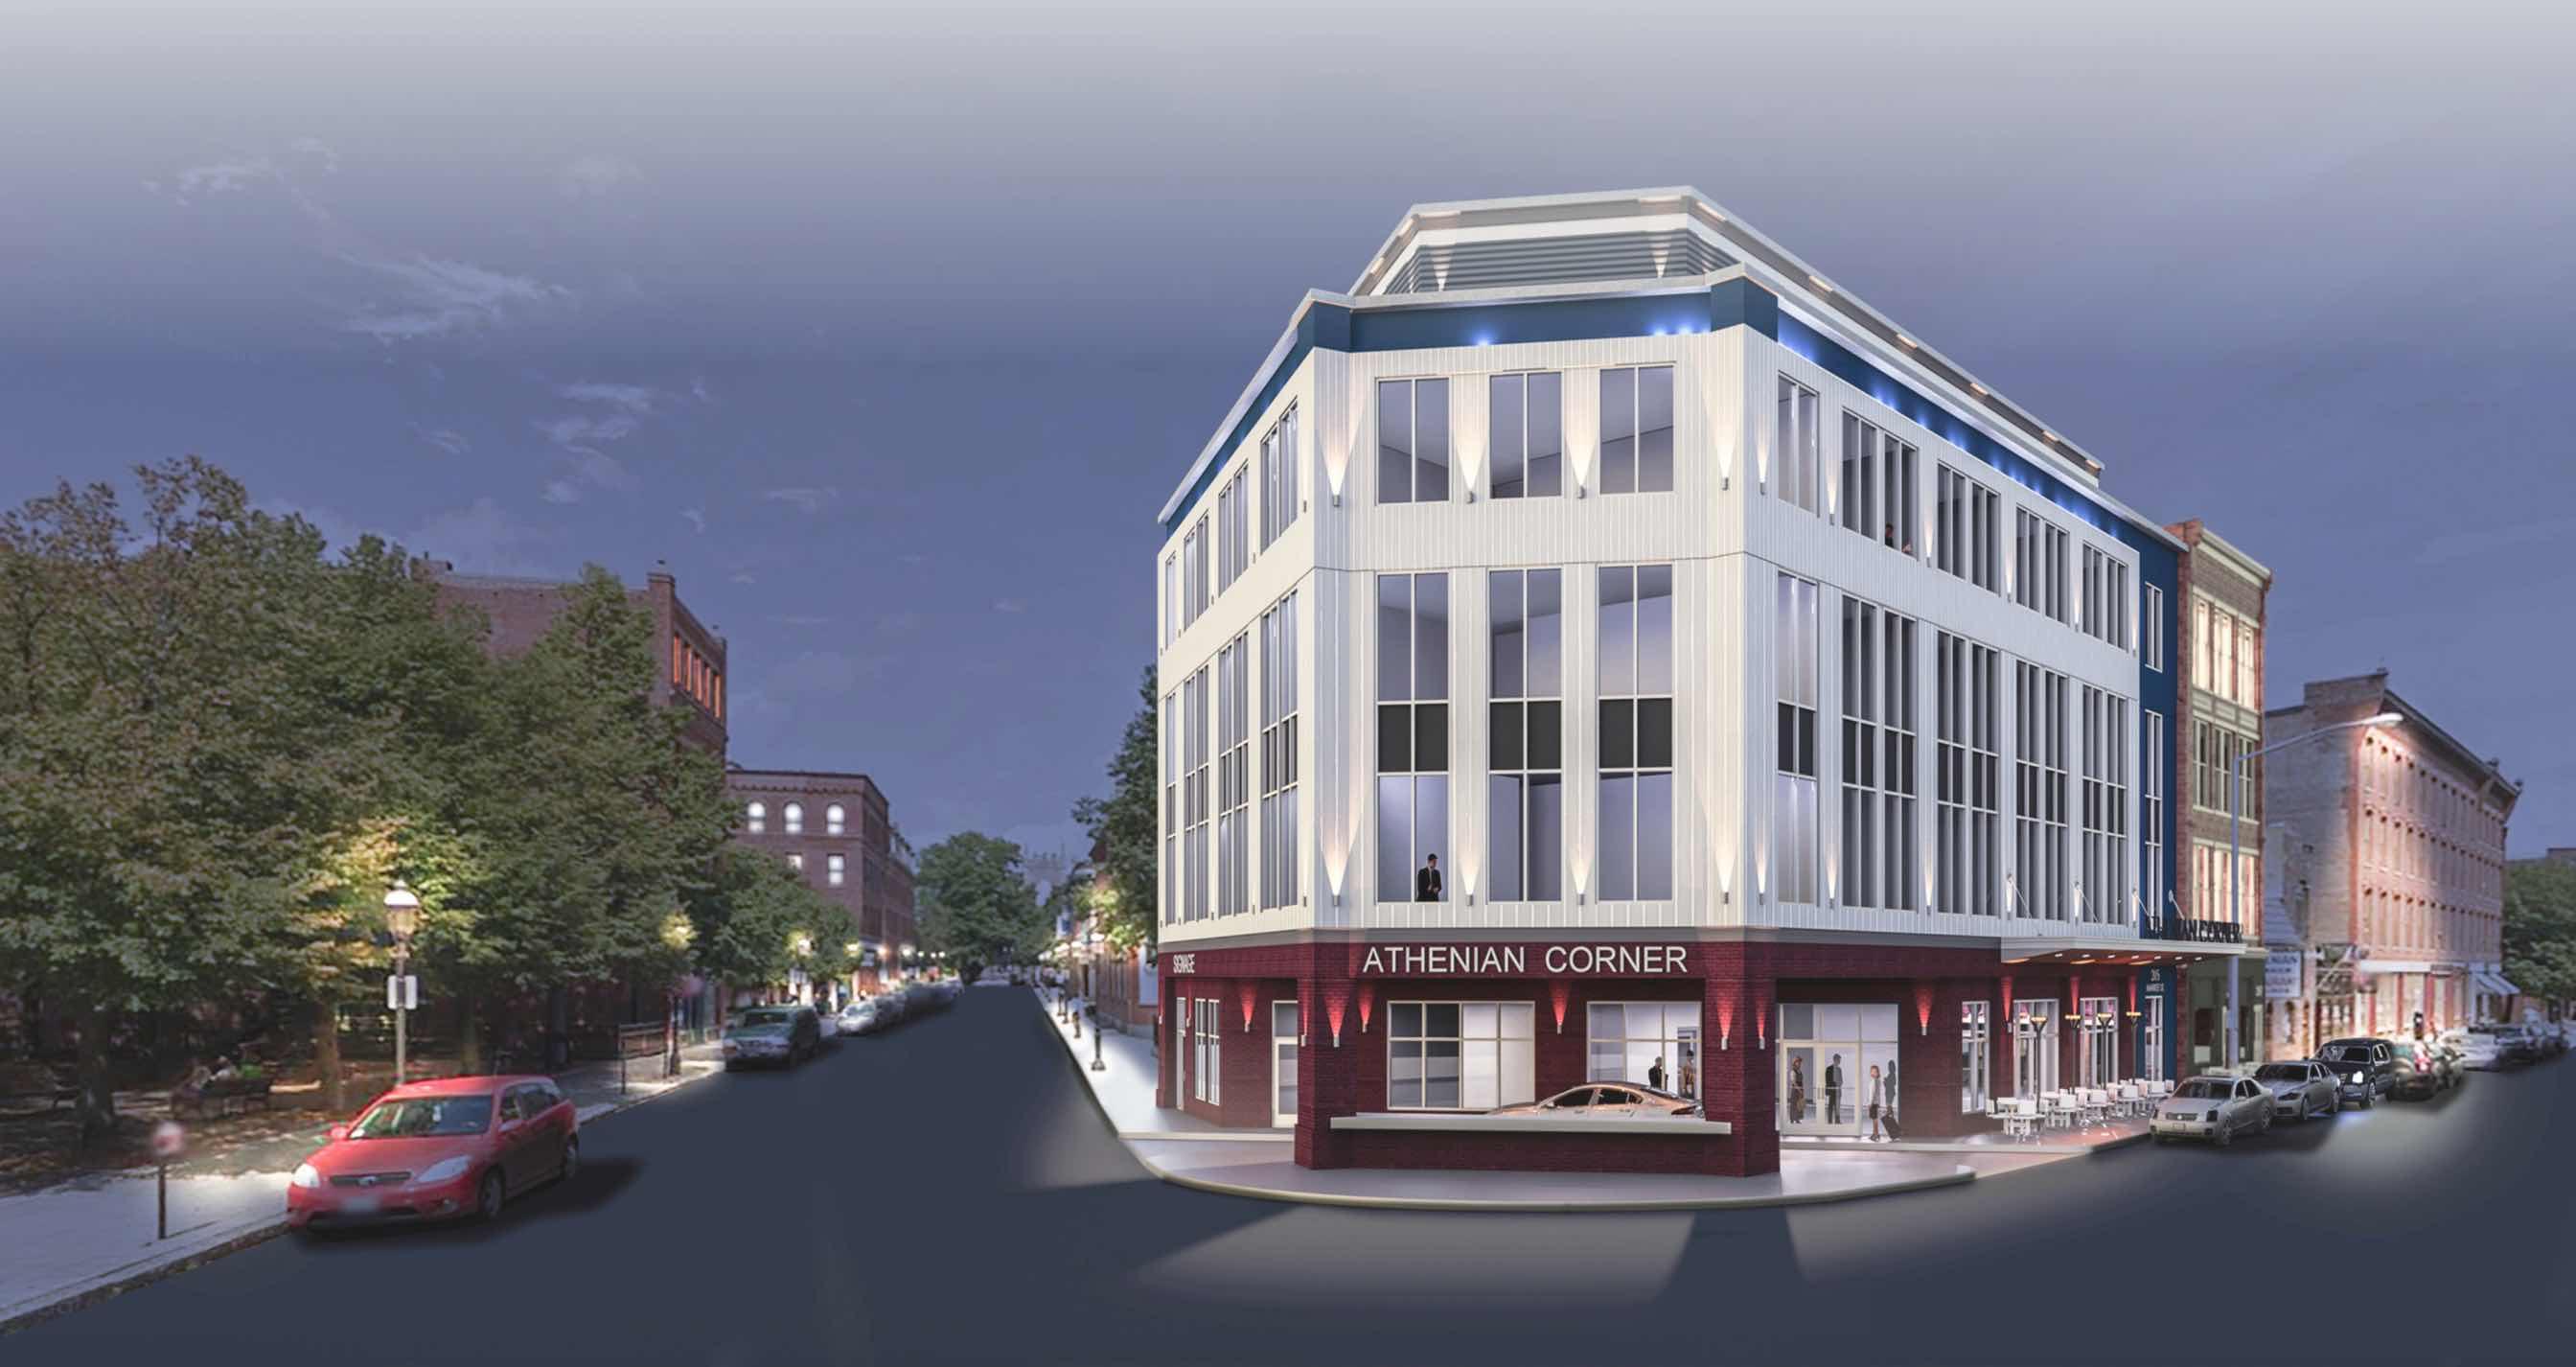 205 207 market street athenian corner hotel restaurant development lowell ma